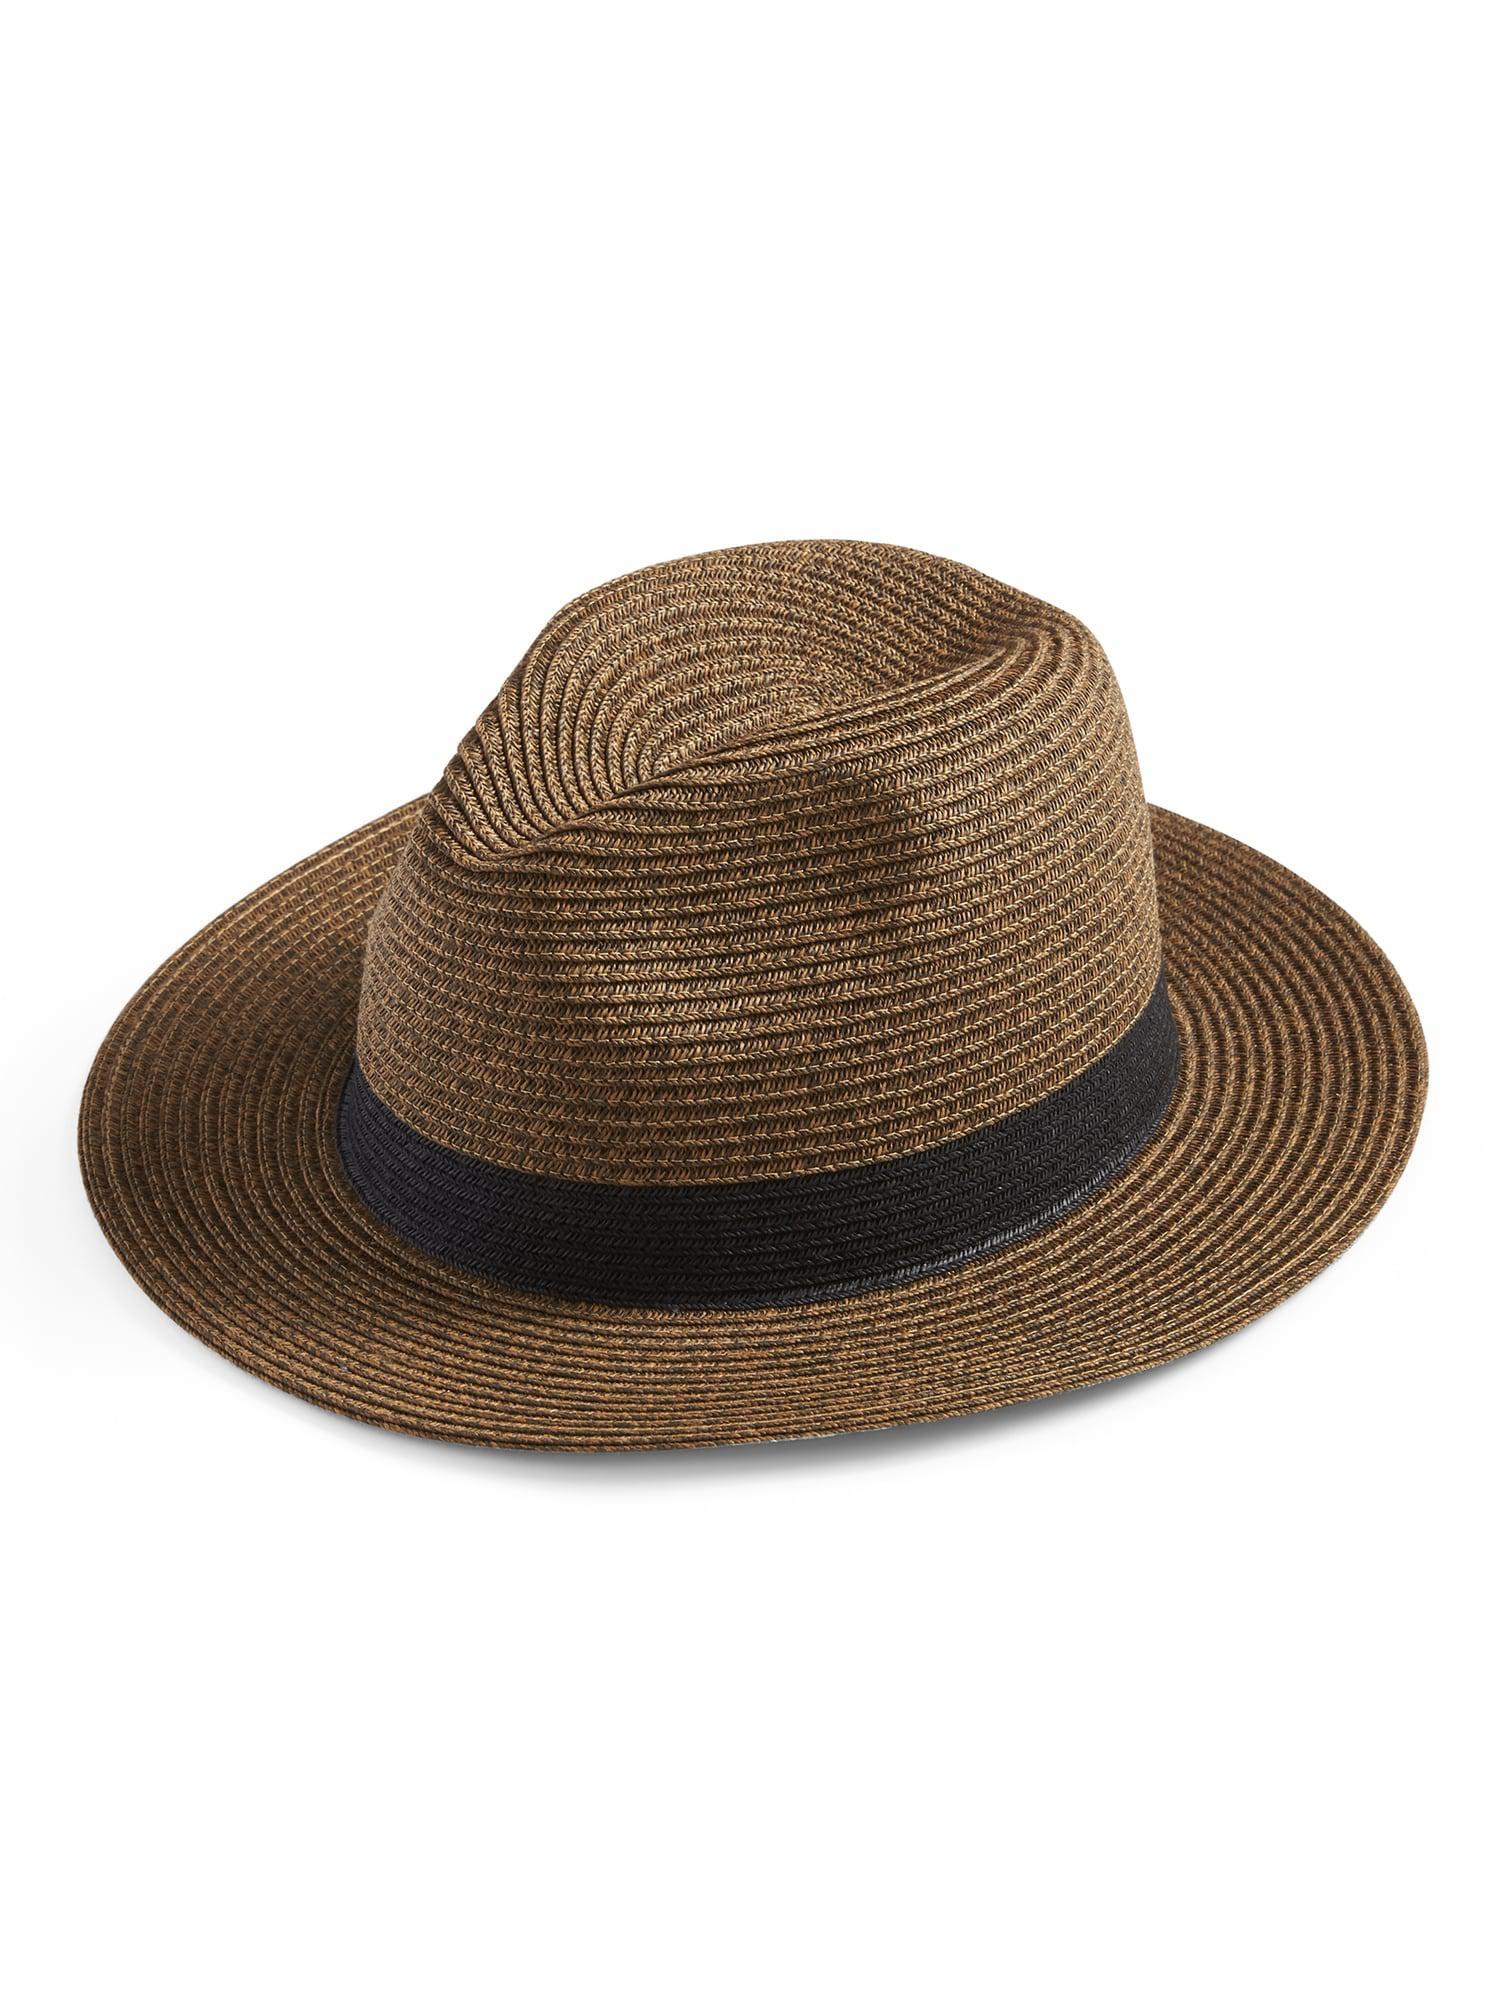 eb0adea22 Banana Republic Brown Straw Fedora Hat